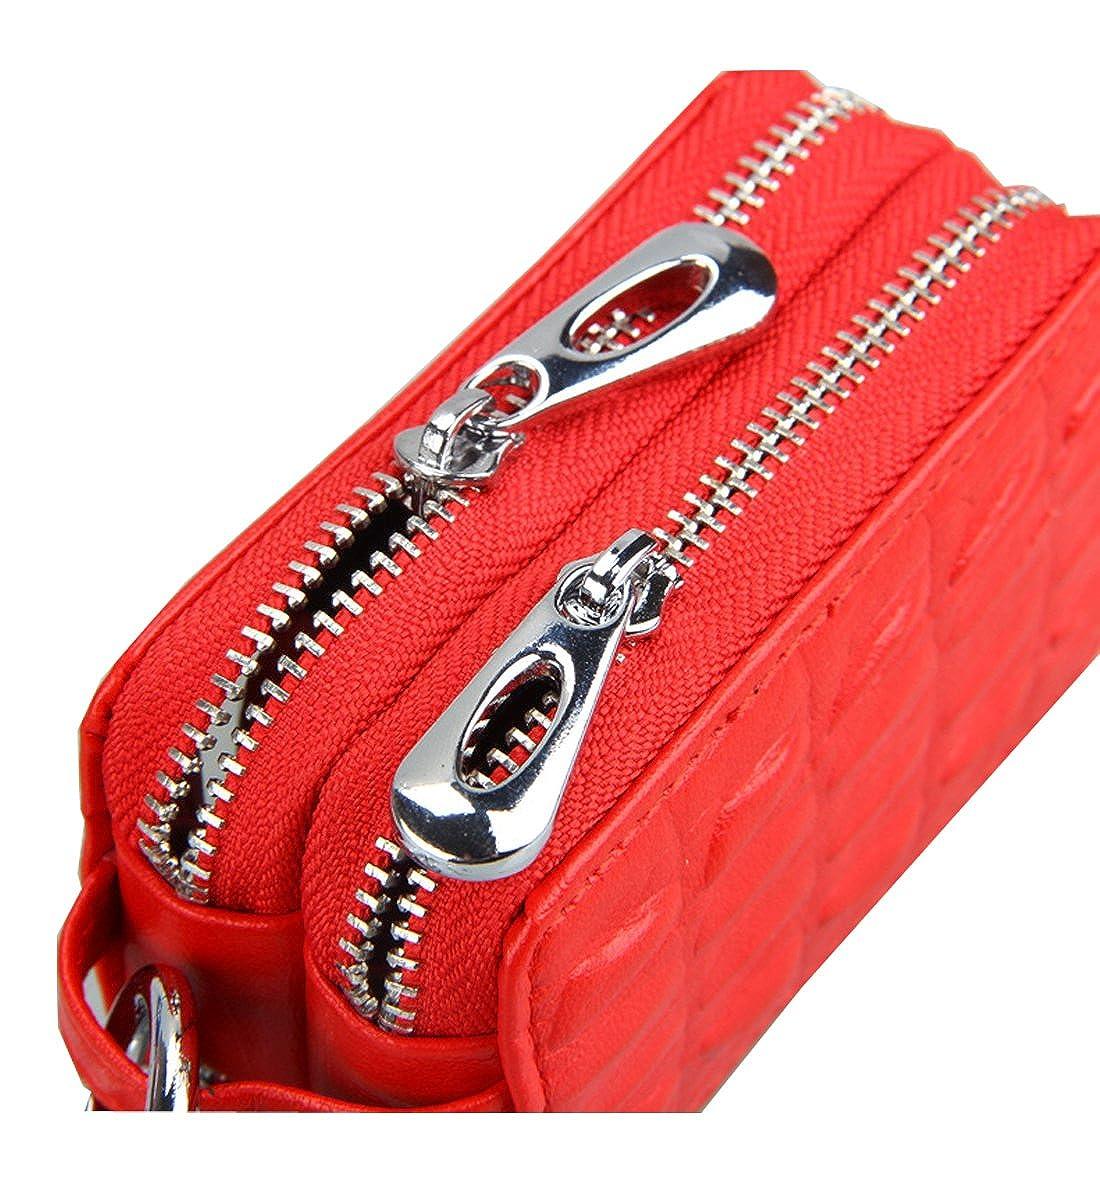 Degohome Car key case Genuine Leather Car Smart Key Chain Key chain Holder Metal Hook Key ring Zipper Bag for Remote Key Fob